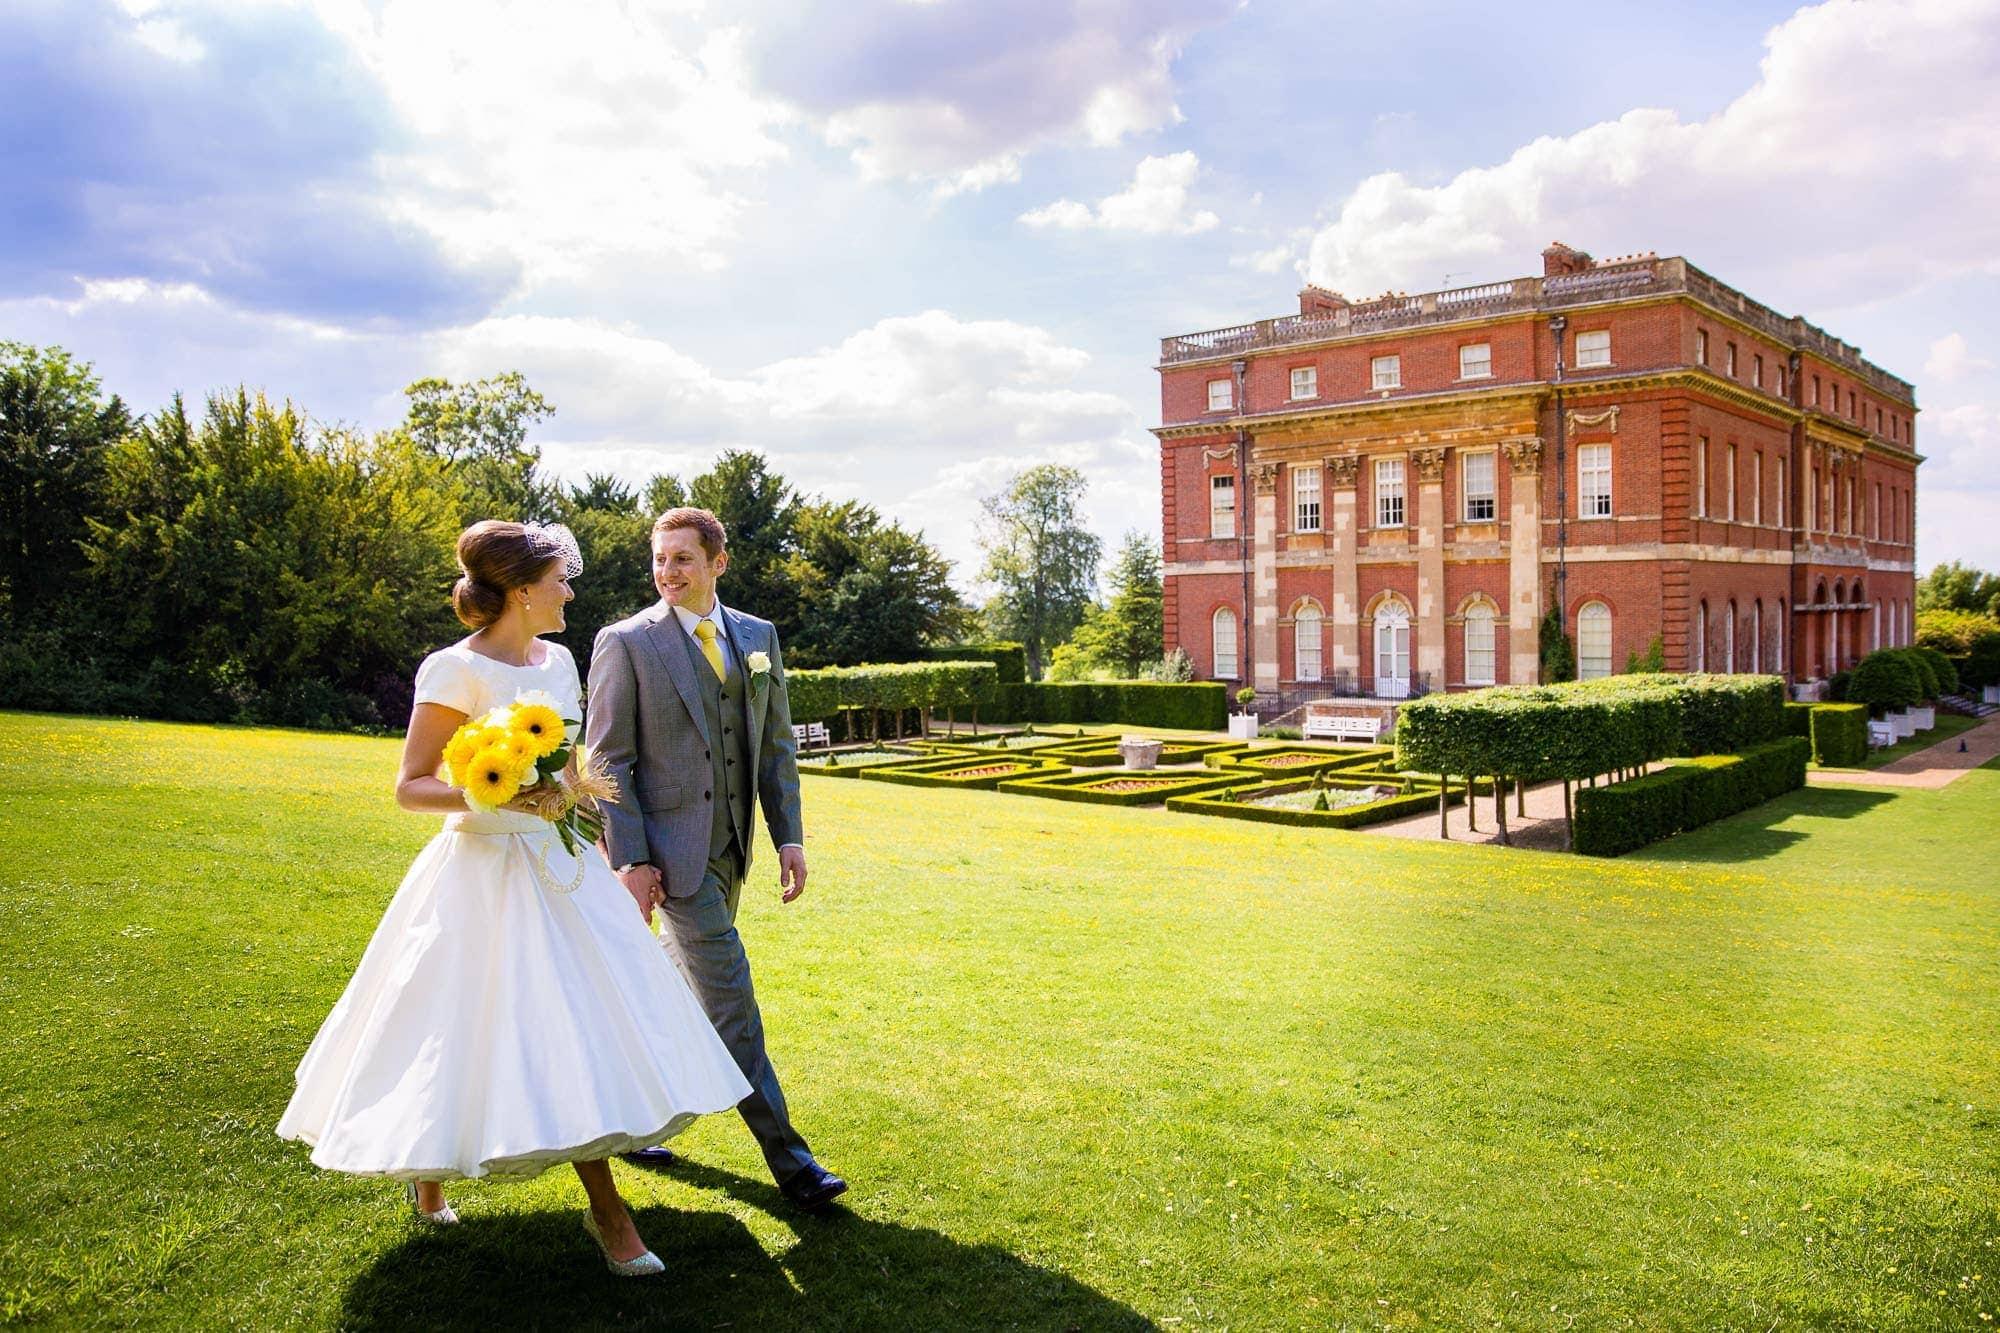 Clandon Park Wedding Photographer 66 5942